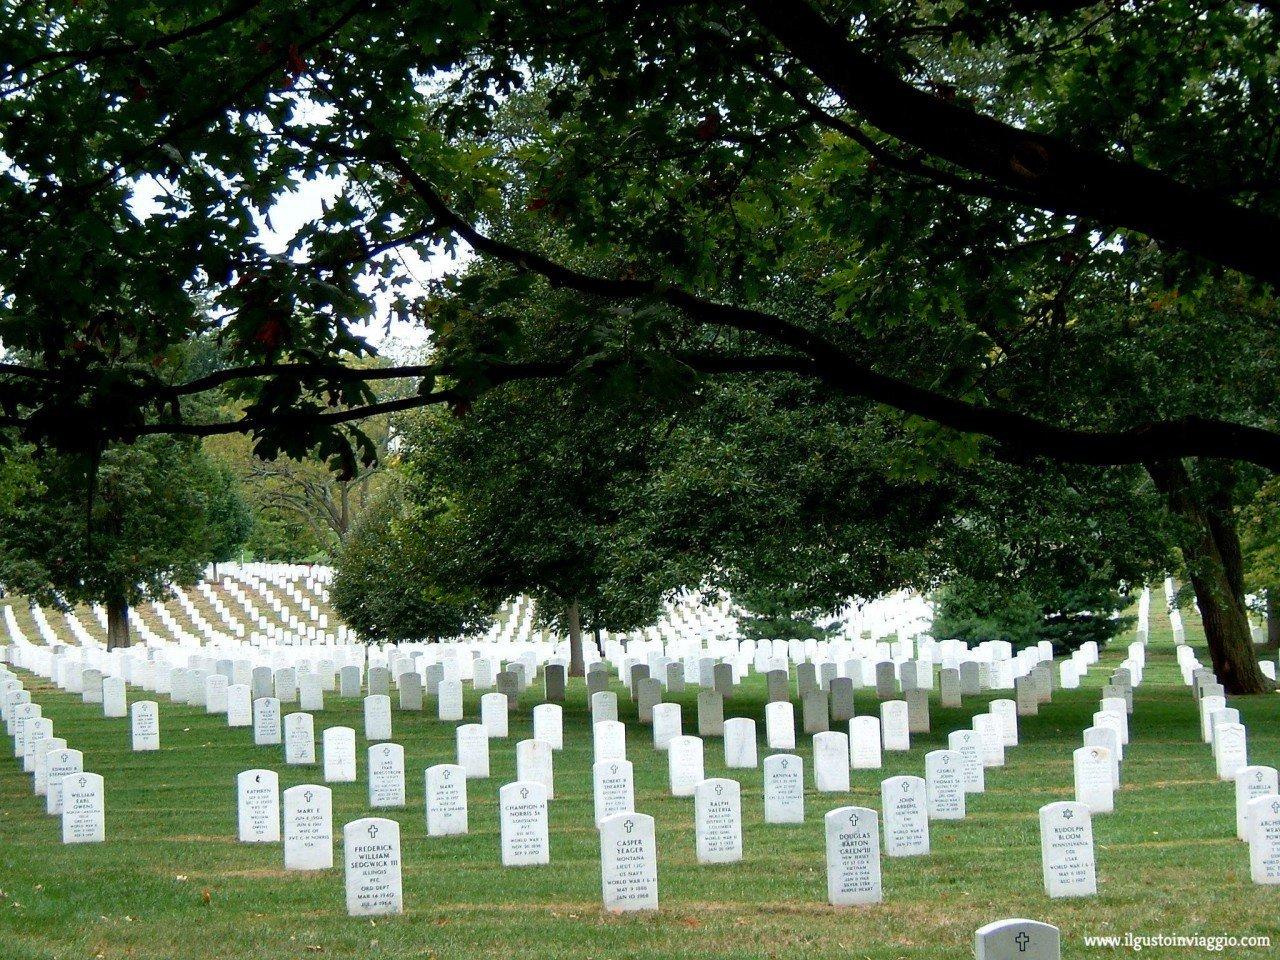 visita al cimitero nazionale di arlington, arlington cimetery